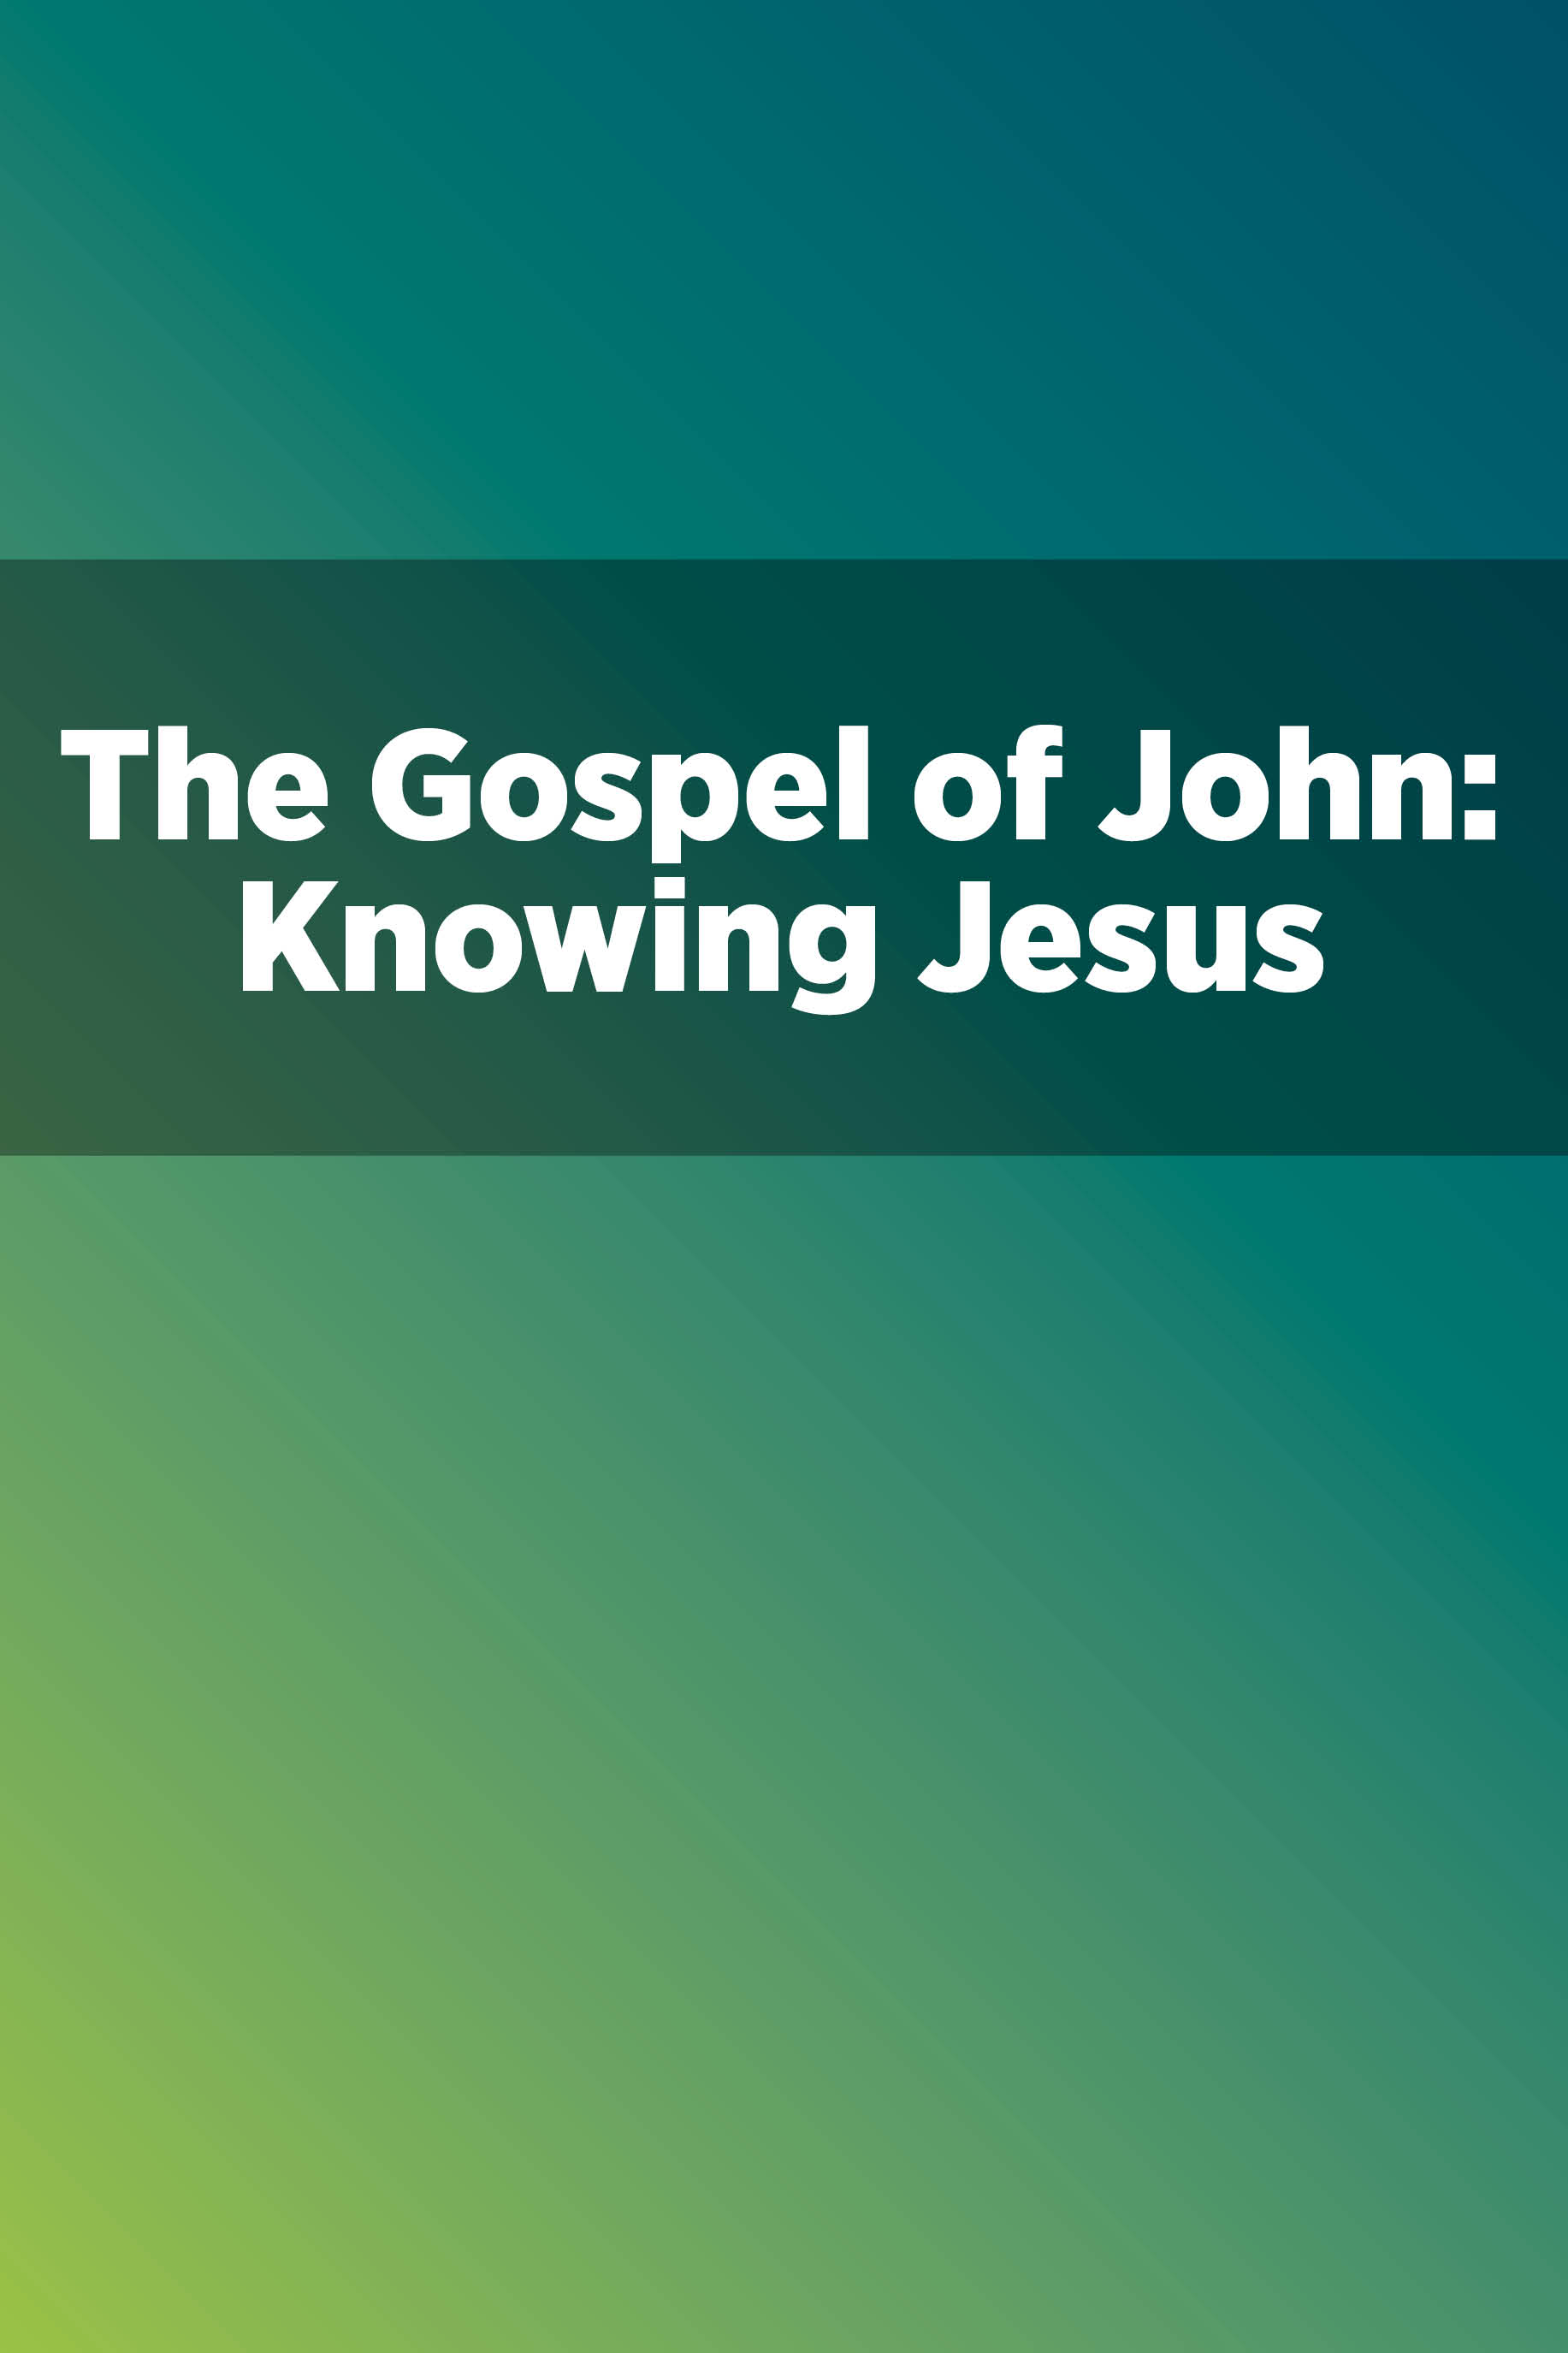 The Gospel of John: Knowing Jesus